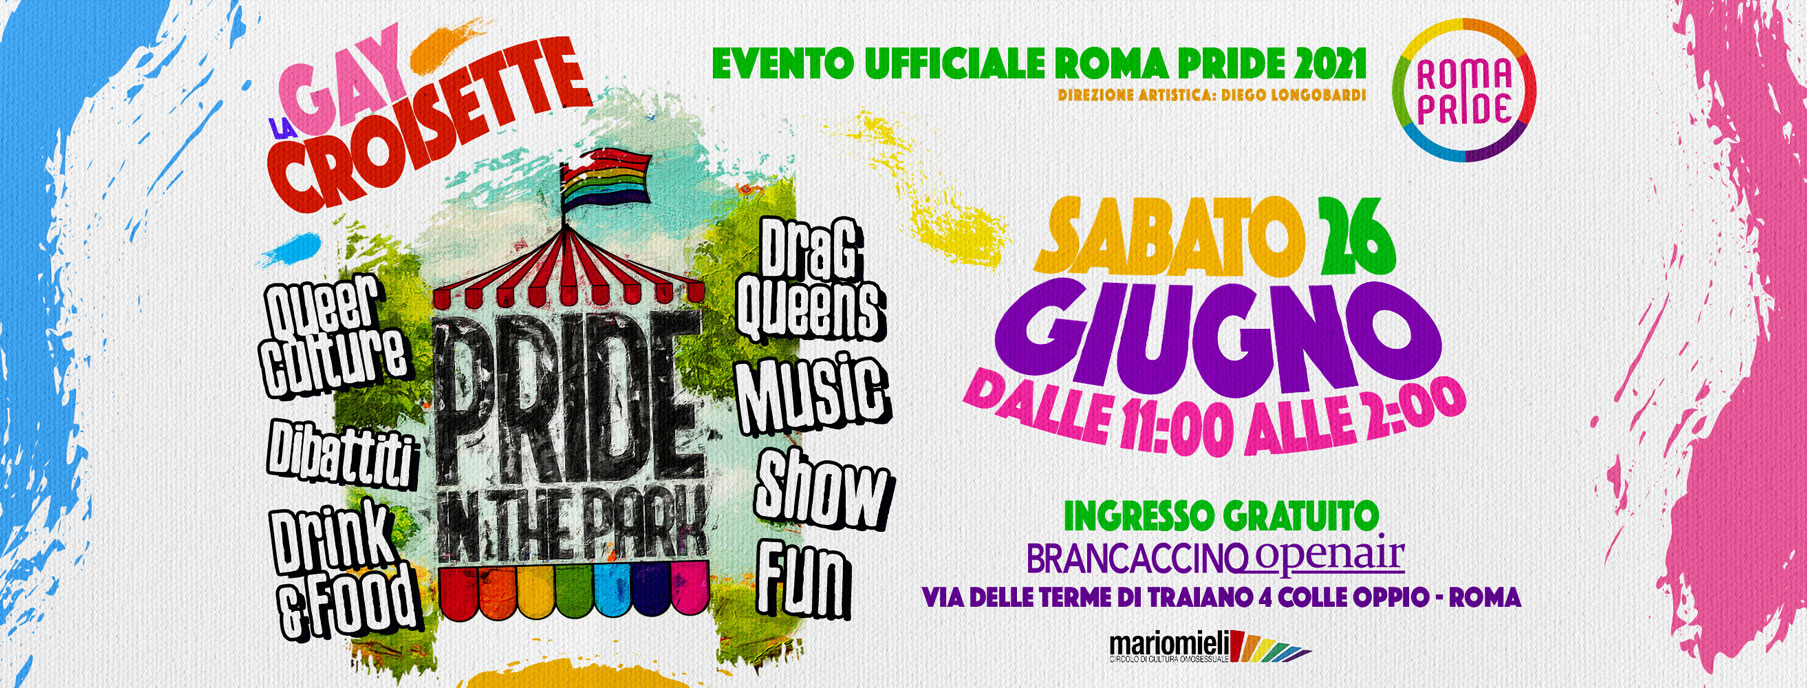 Roma Pride 2021 - Pride in the Park